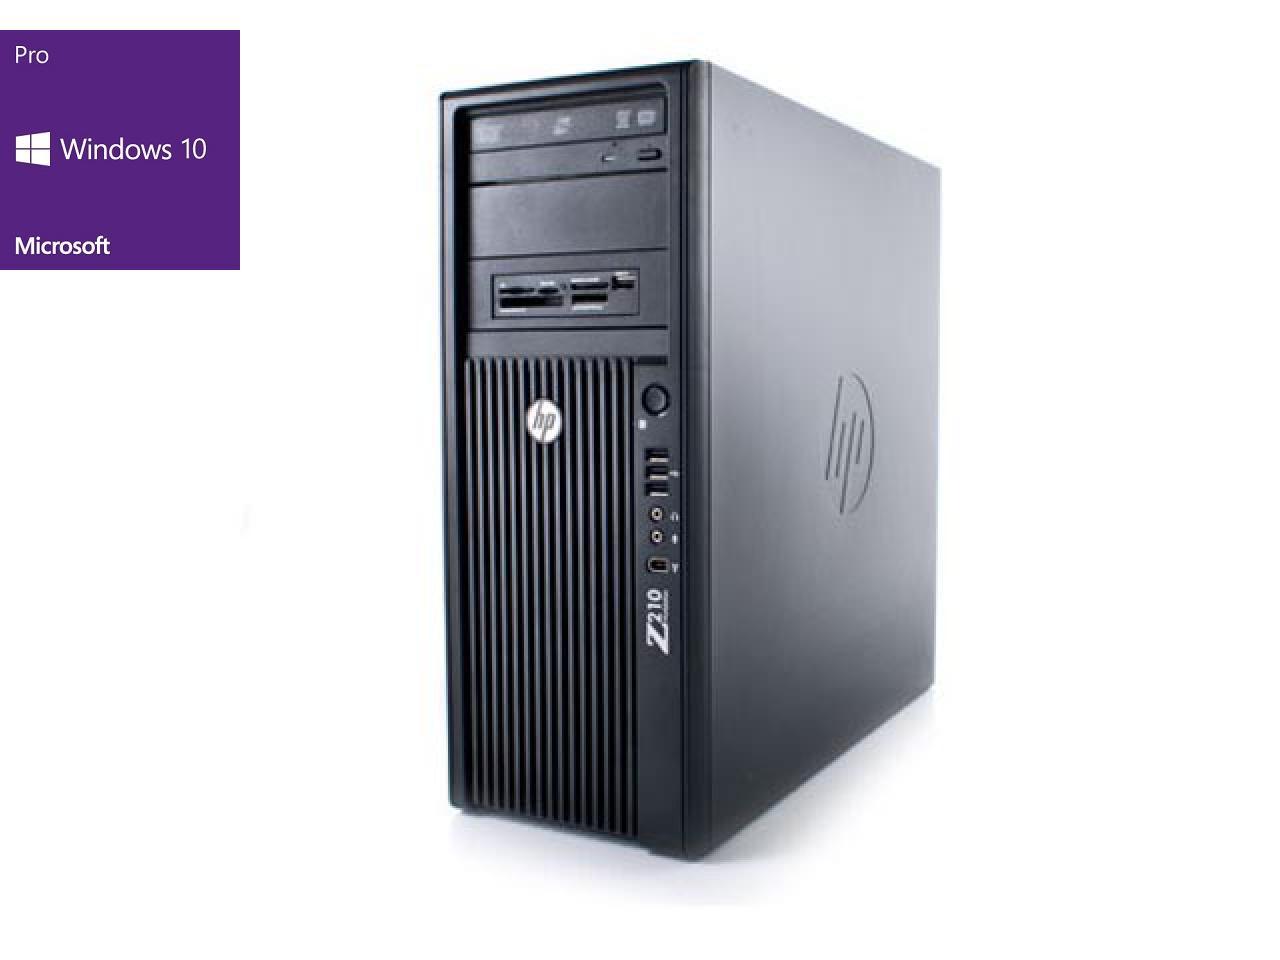 Hewlett Packard Z210 T